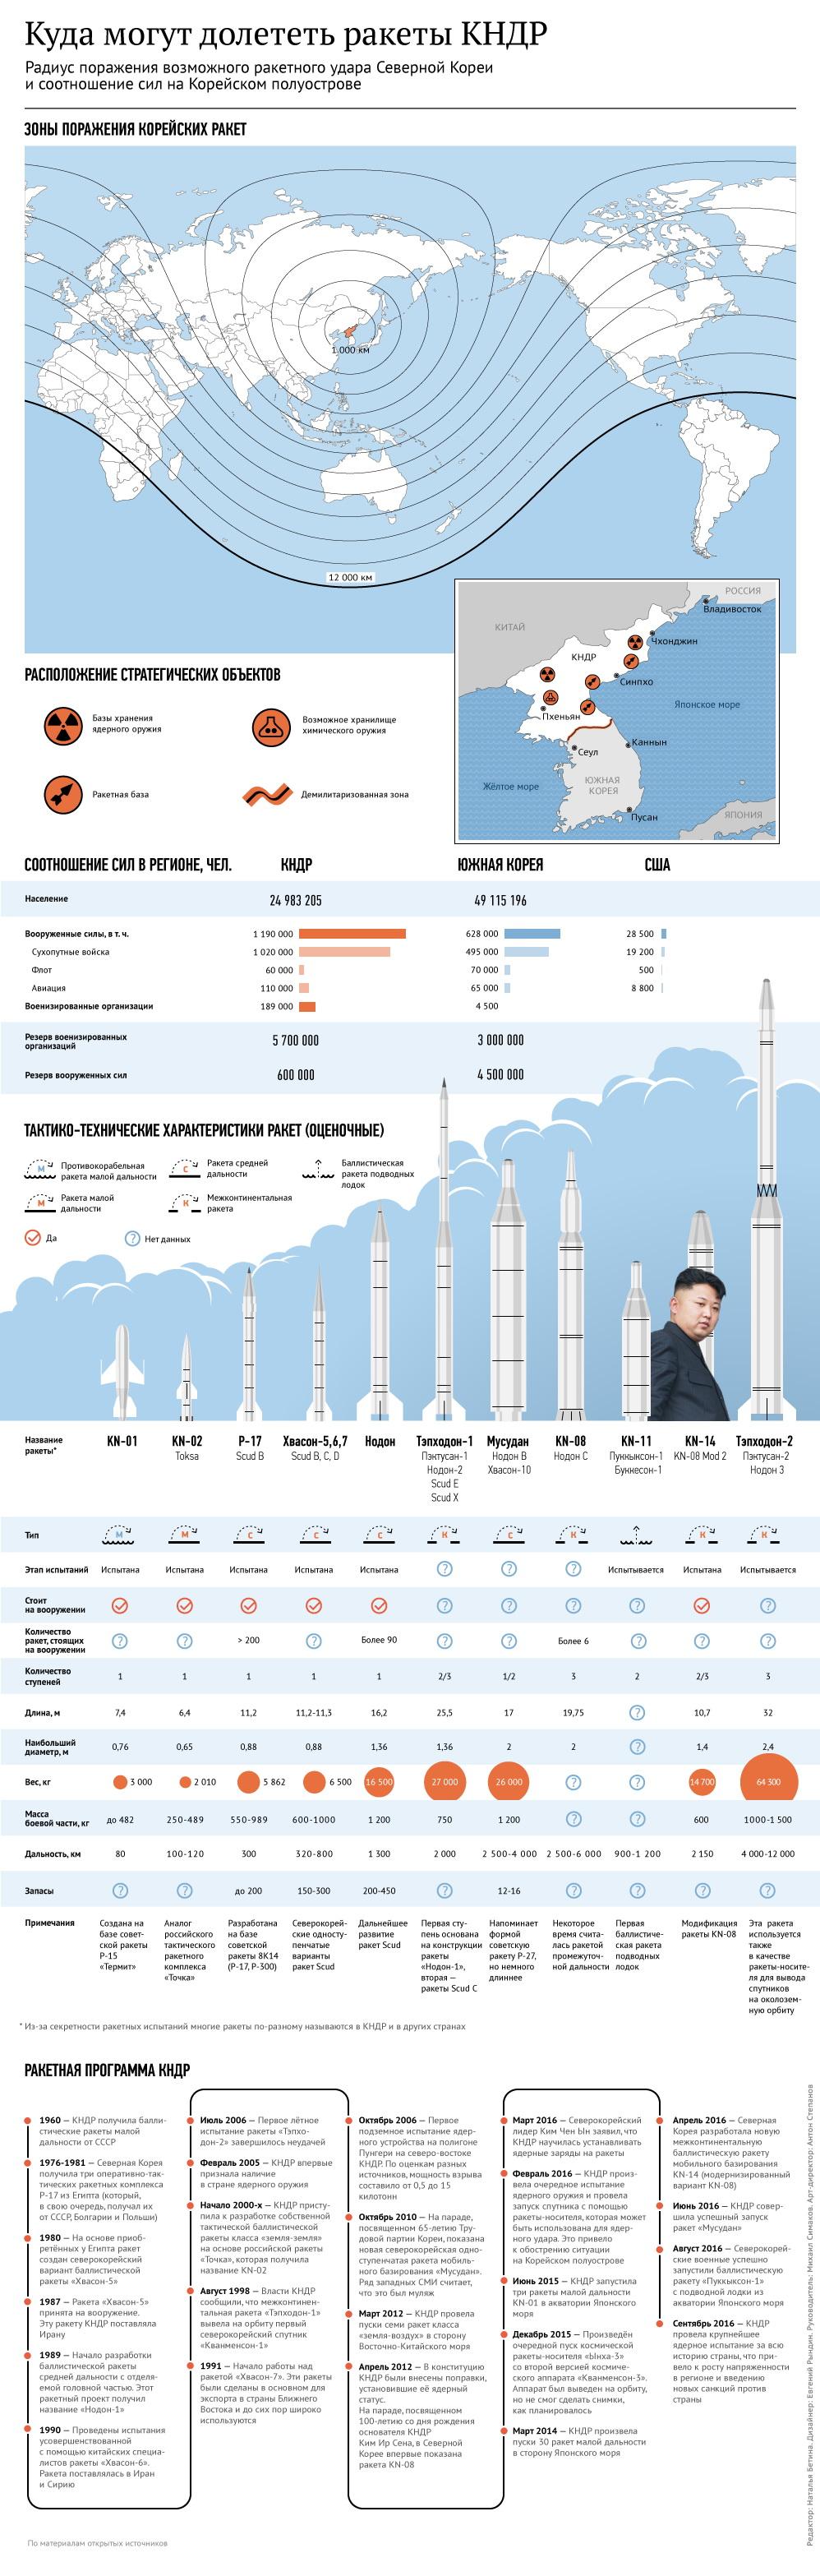 Фото: РИА Новости, Инфографика